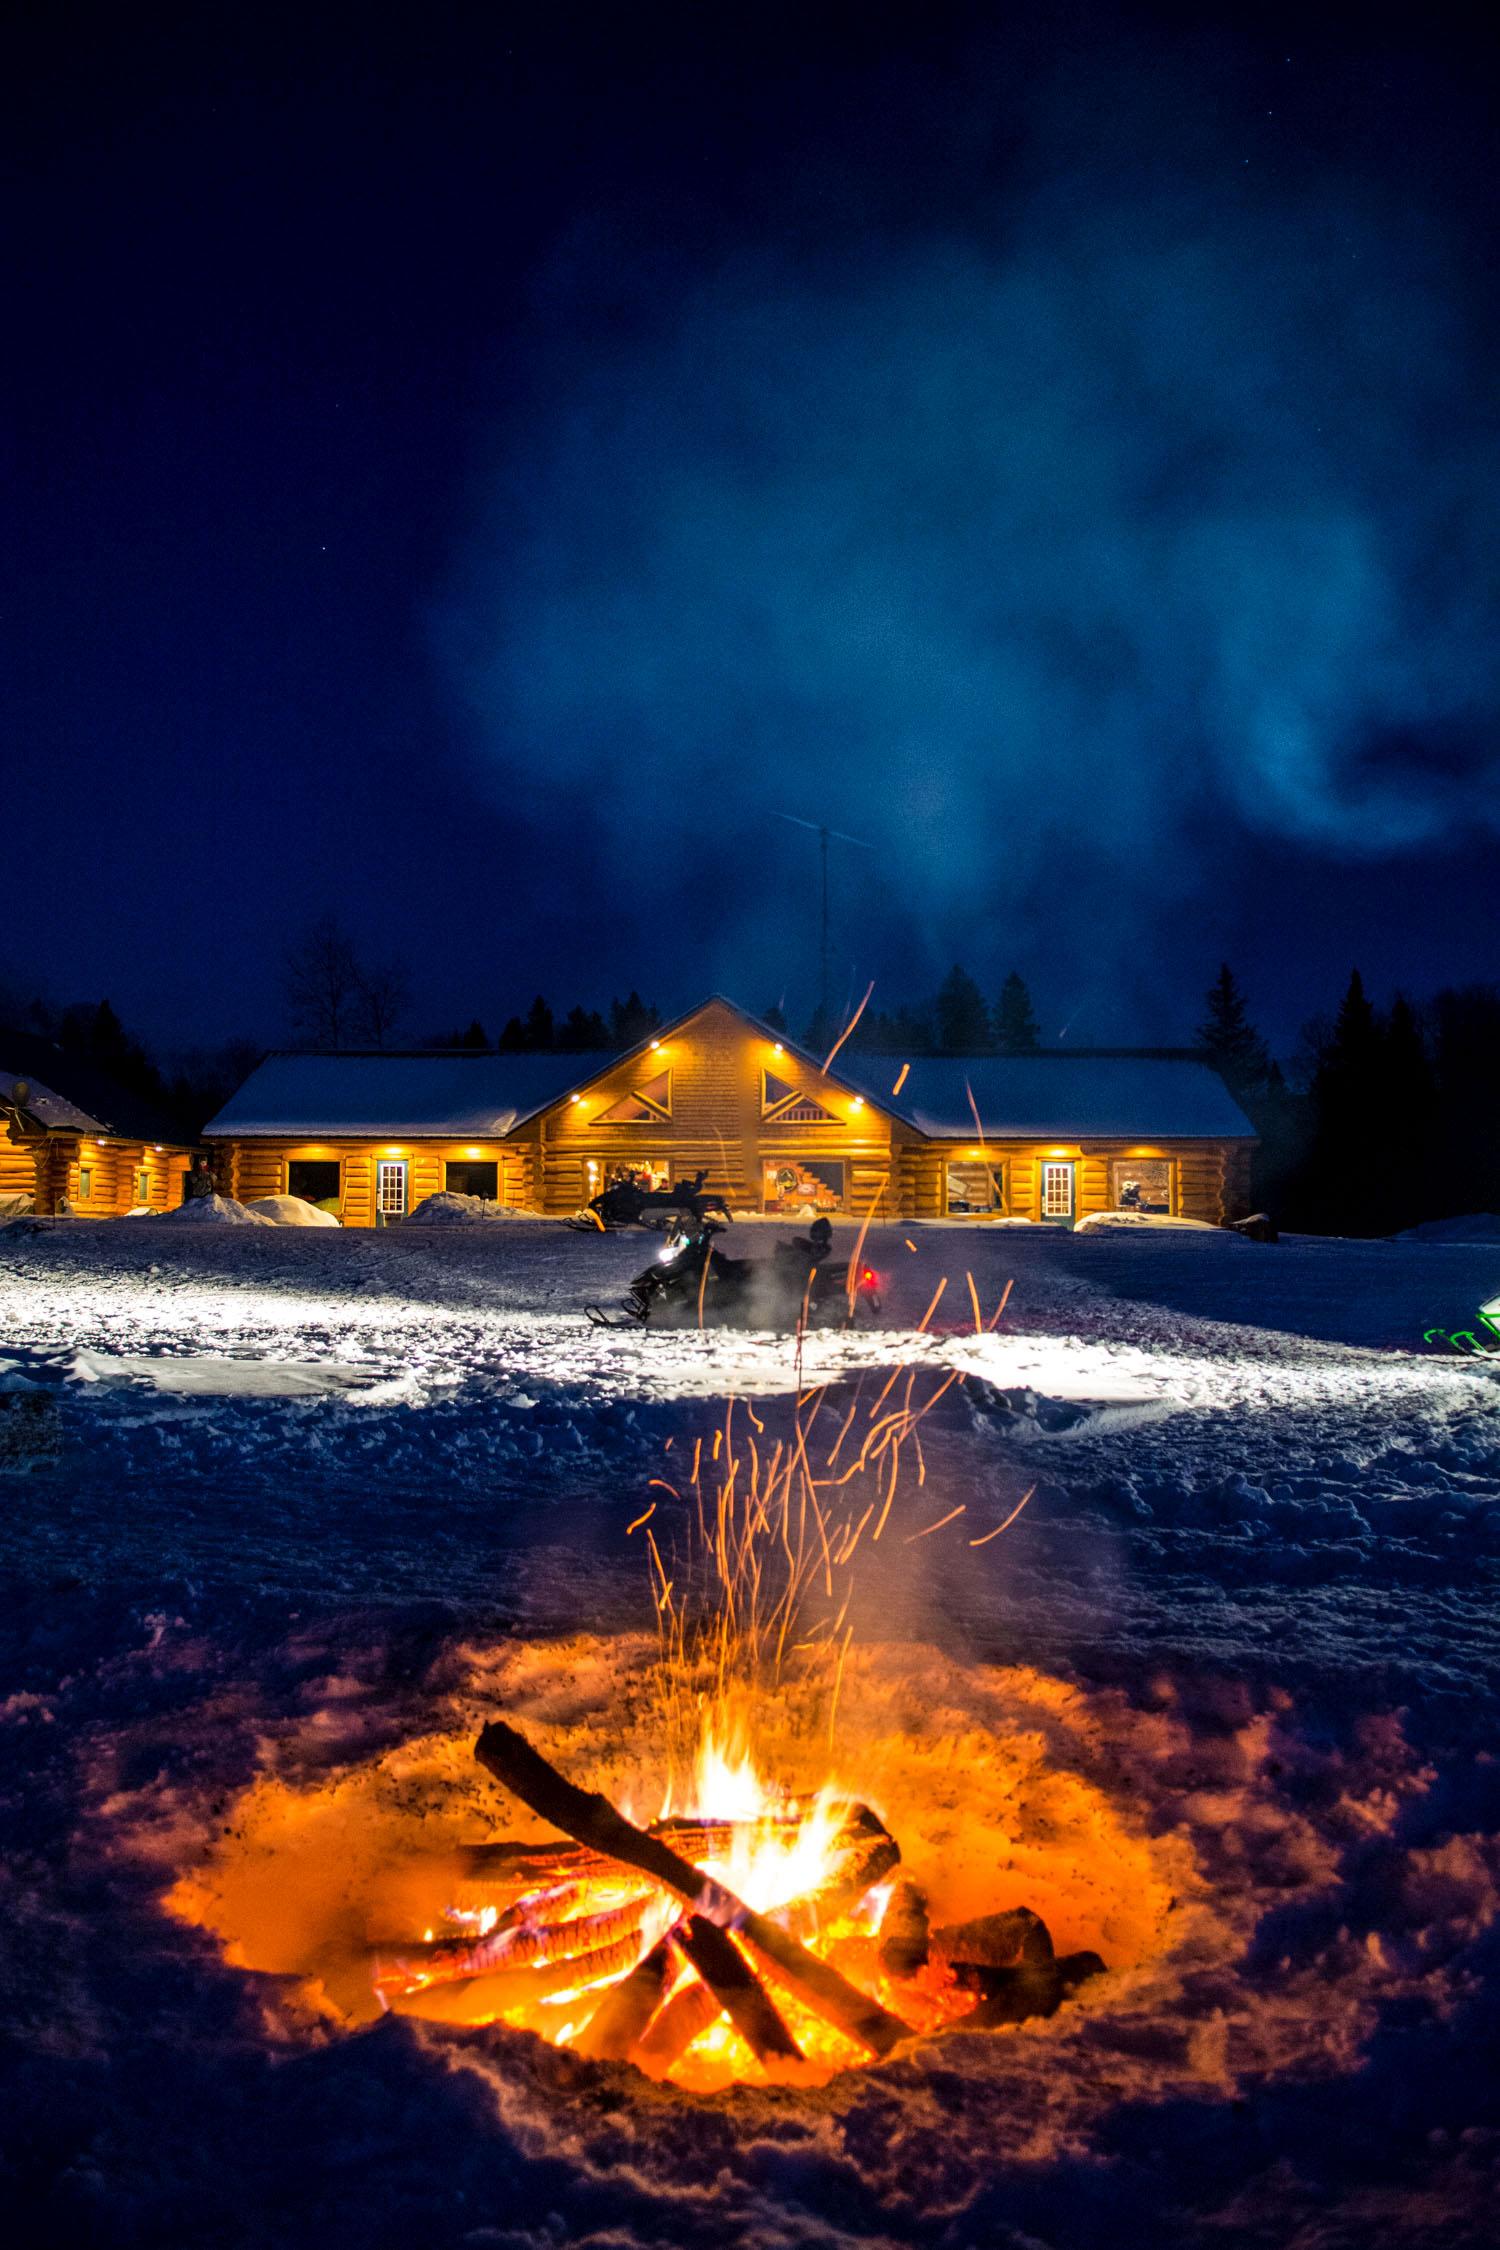 feb10-11 2015-Tourism New Brunswick-T4G Kick-winter 2015-New Brunswick Great Northern Odyssey-snowmobile trip-Mount Carleton-NB-photo by Aaron McKenzie Fraser-www.amfraser.com-_AMF8036.jpg